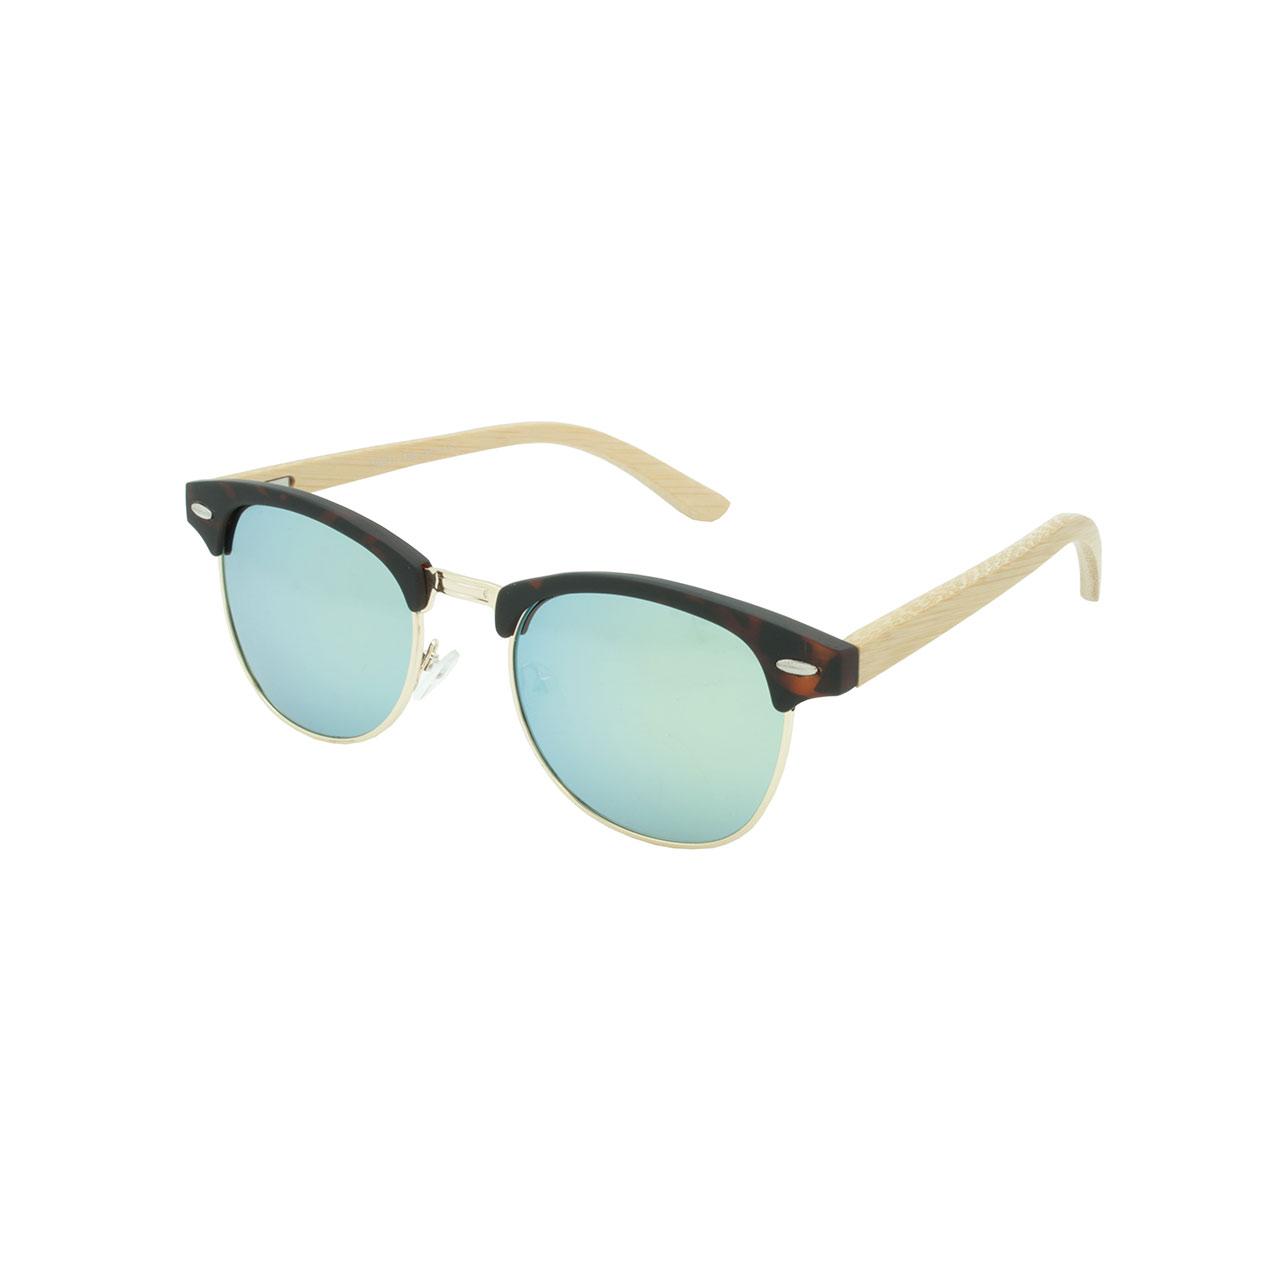 unisex-sunglasses-spring-hinge-soft-touch-demi-gold-frame-gold-mirror-lens-bamboo-temple-fes04.jpg